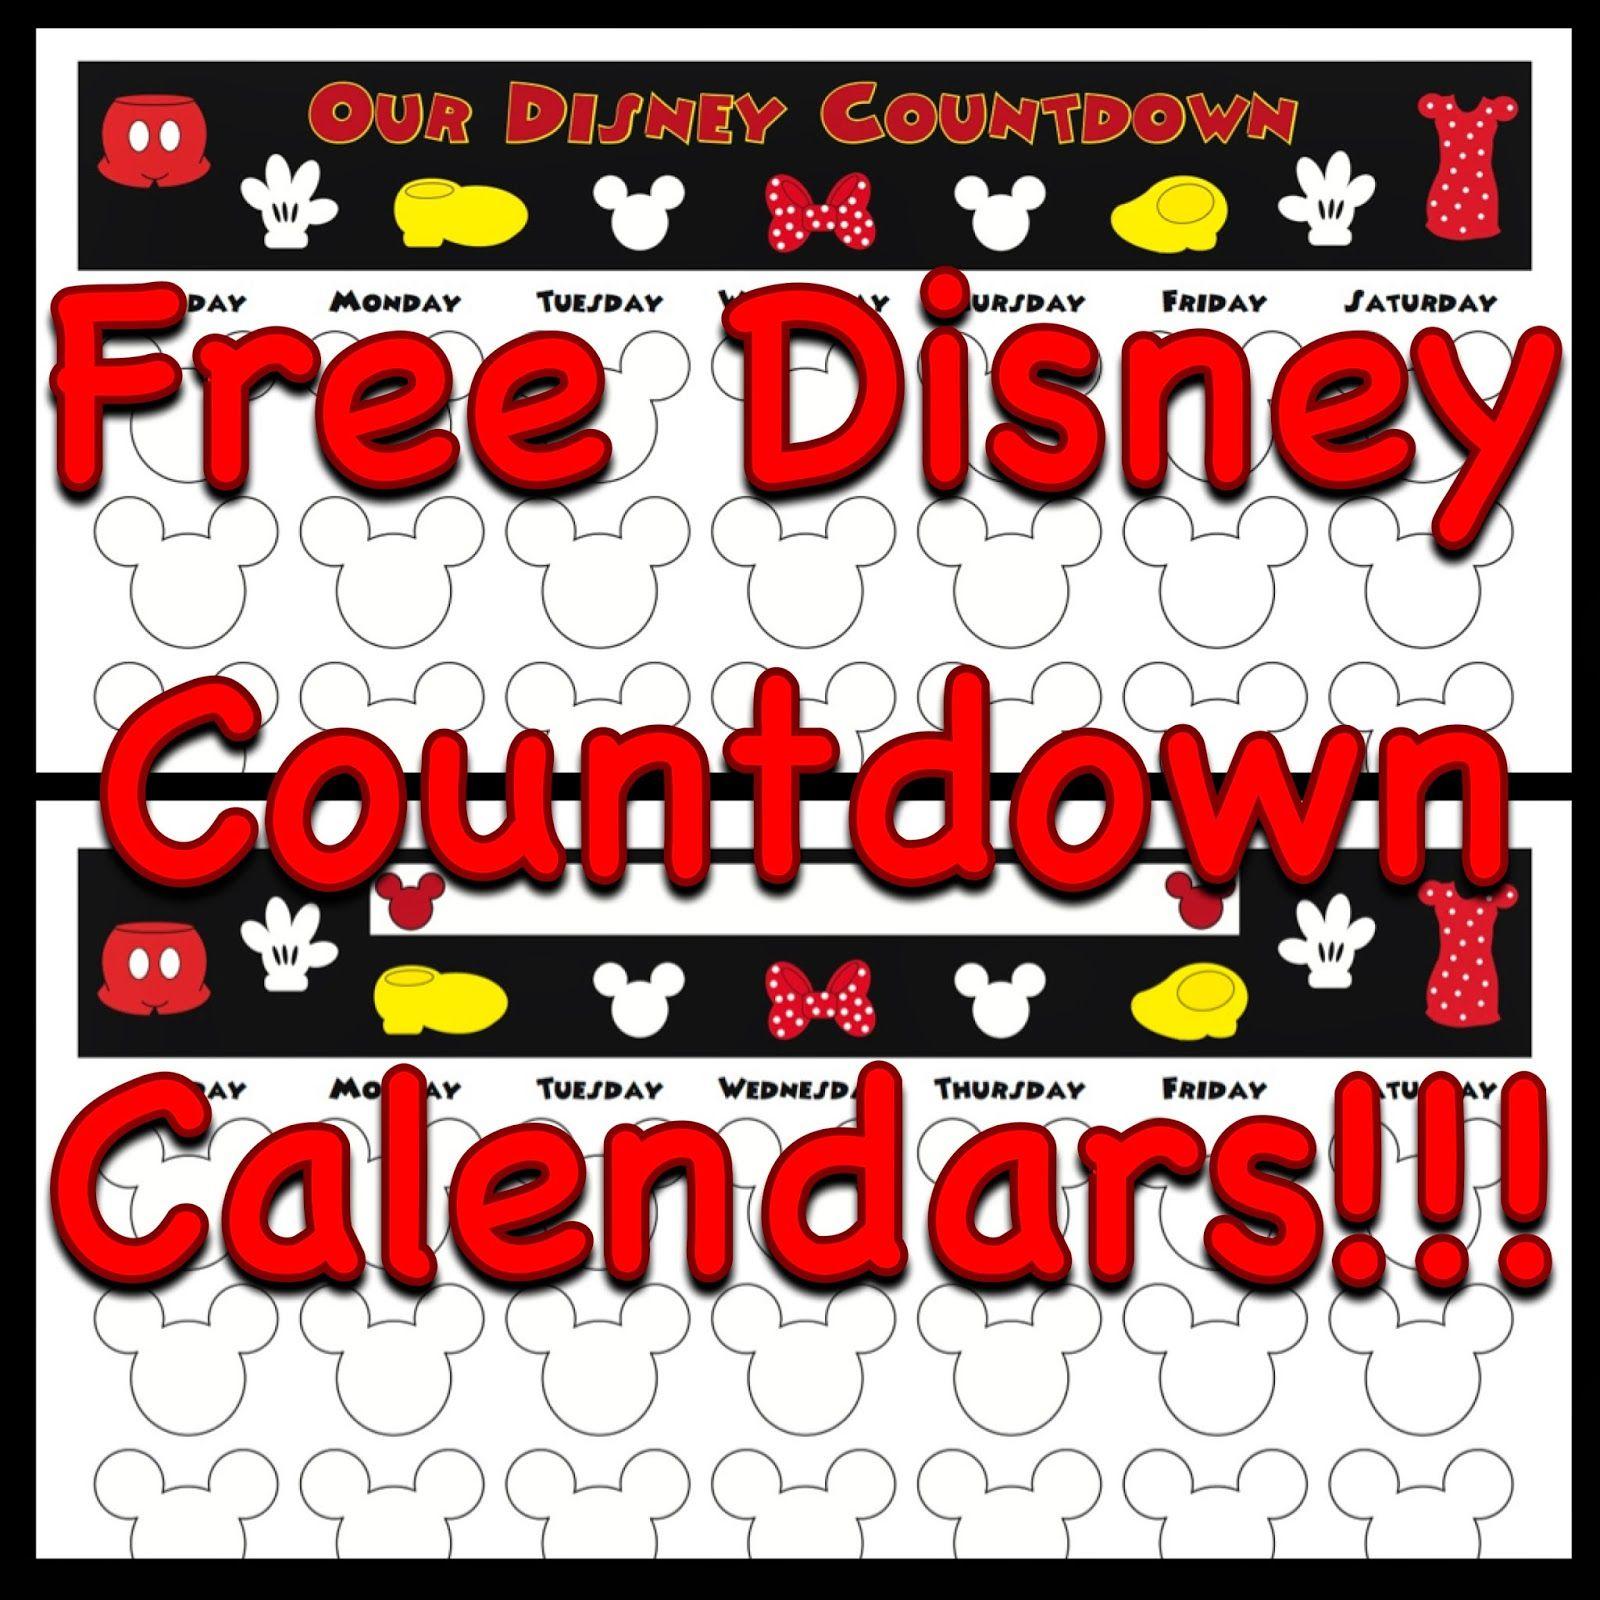 My Disney Life: Countdown Calendars | Disneyland  Usa within Disney World Countdown Calendar Printable